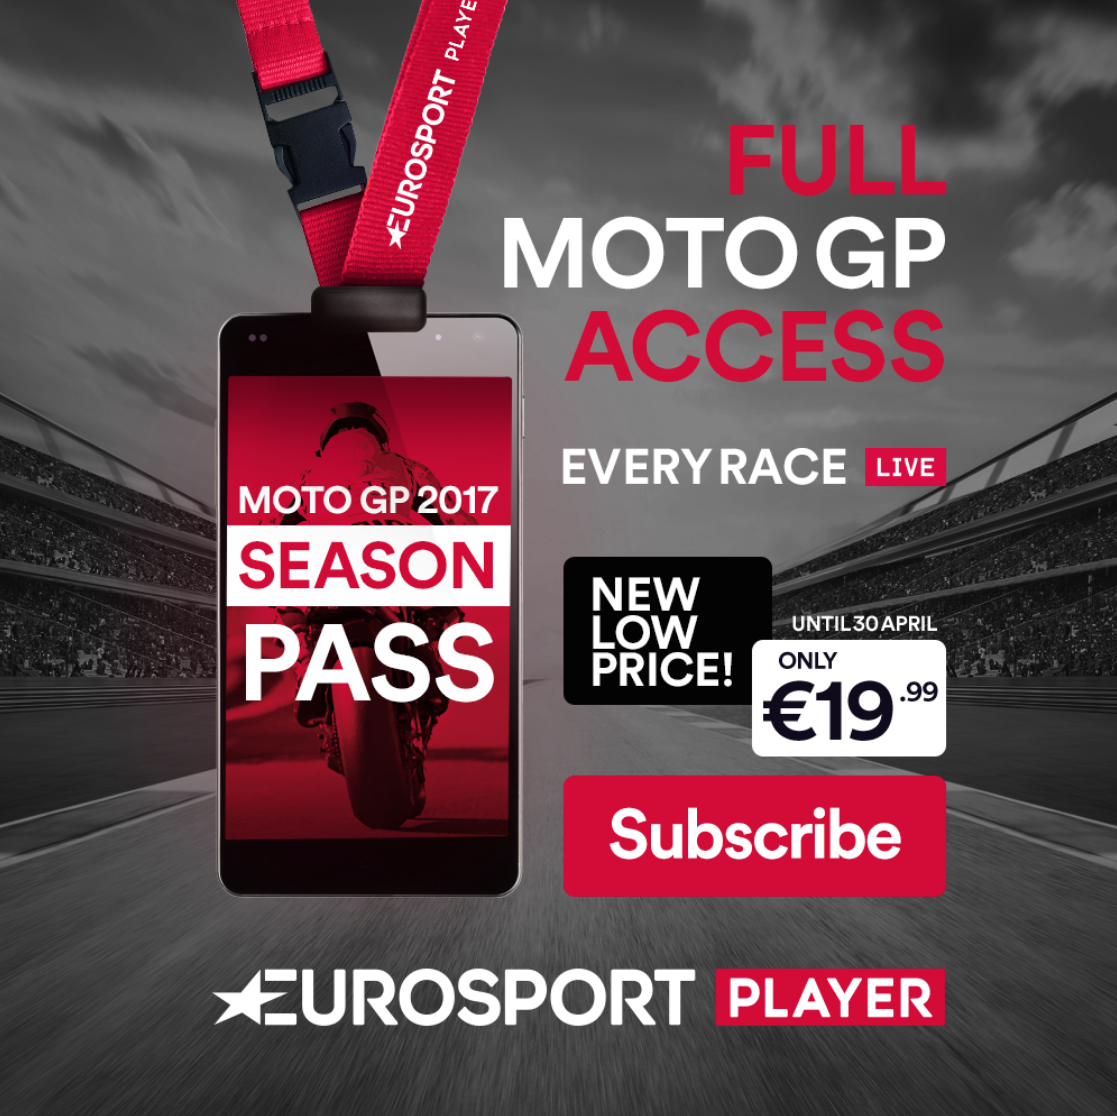 Eurosport Player Motogp Angebot